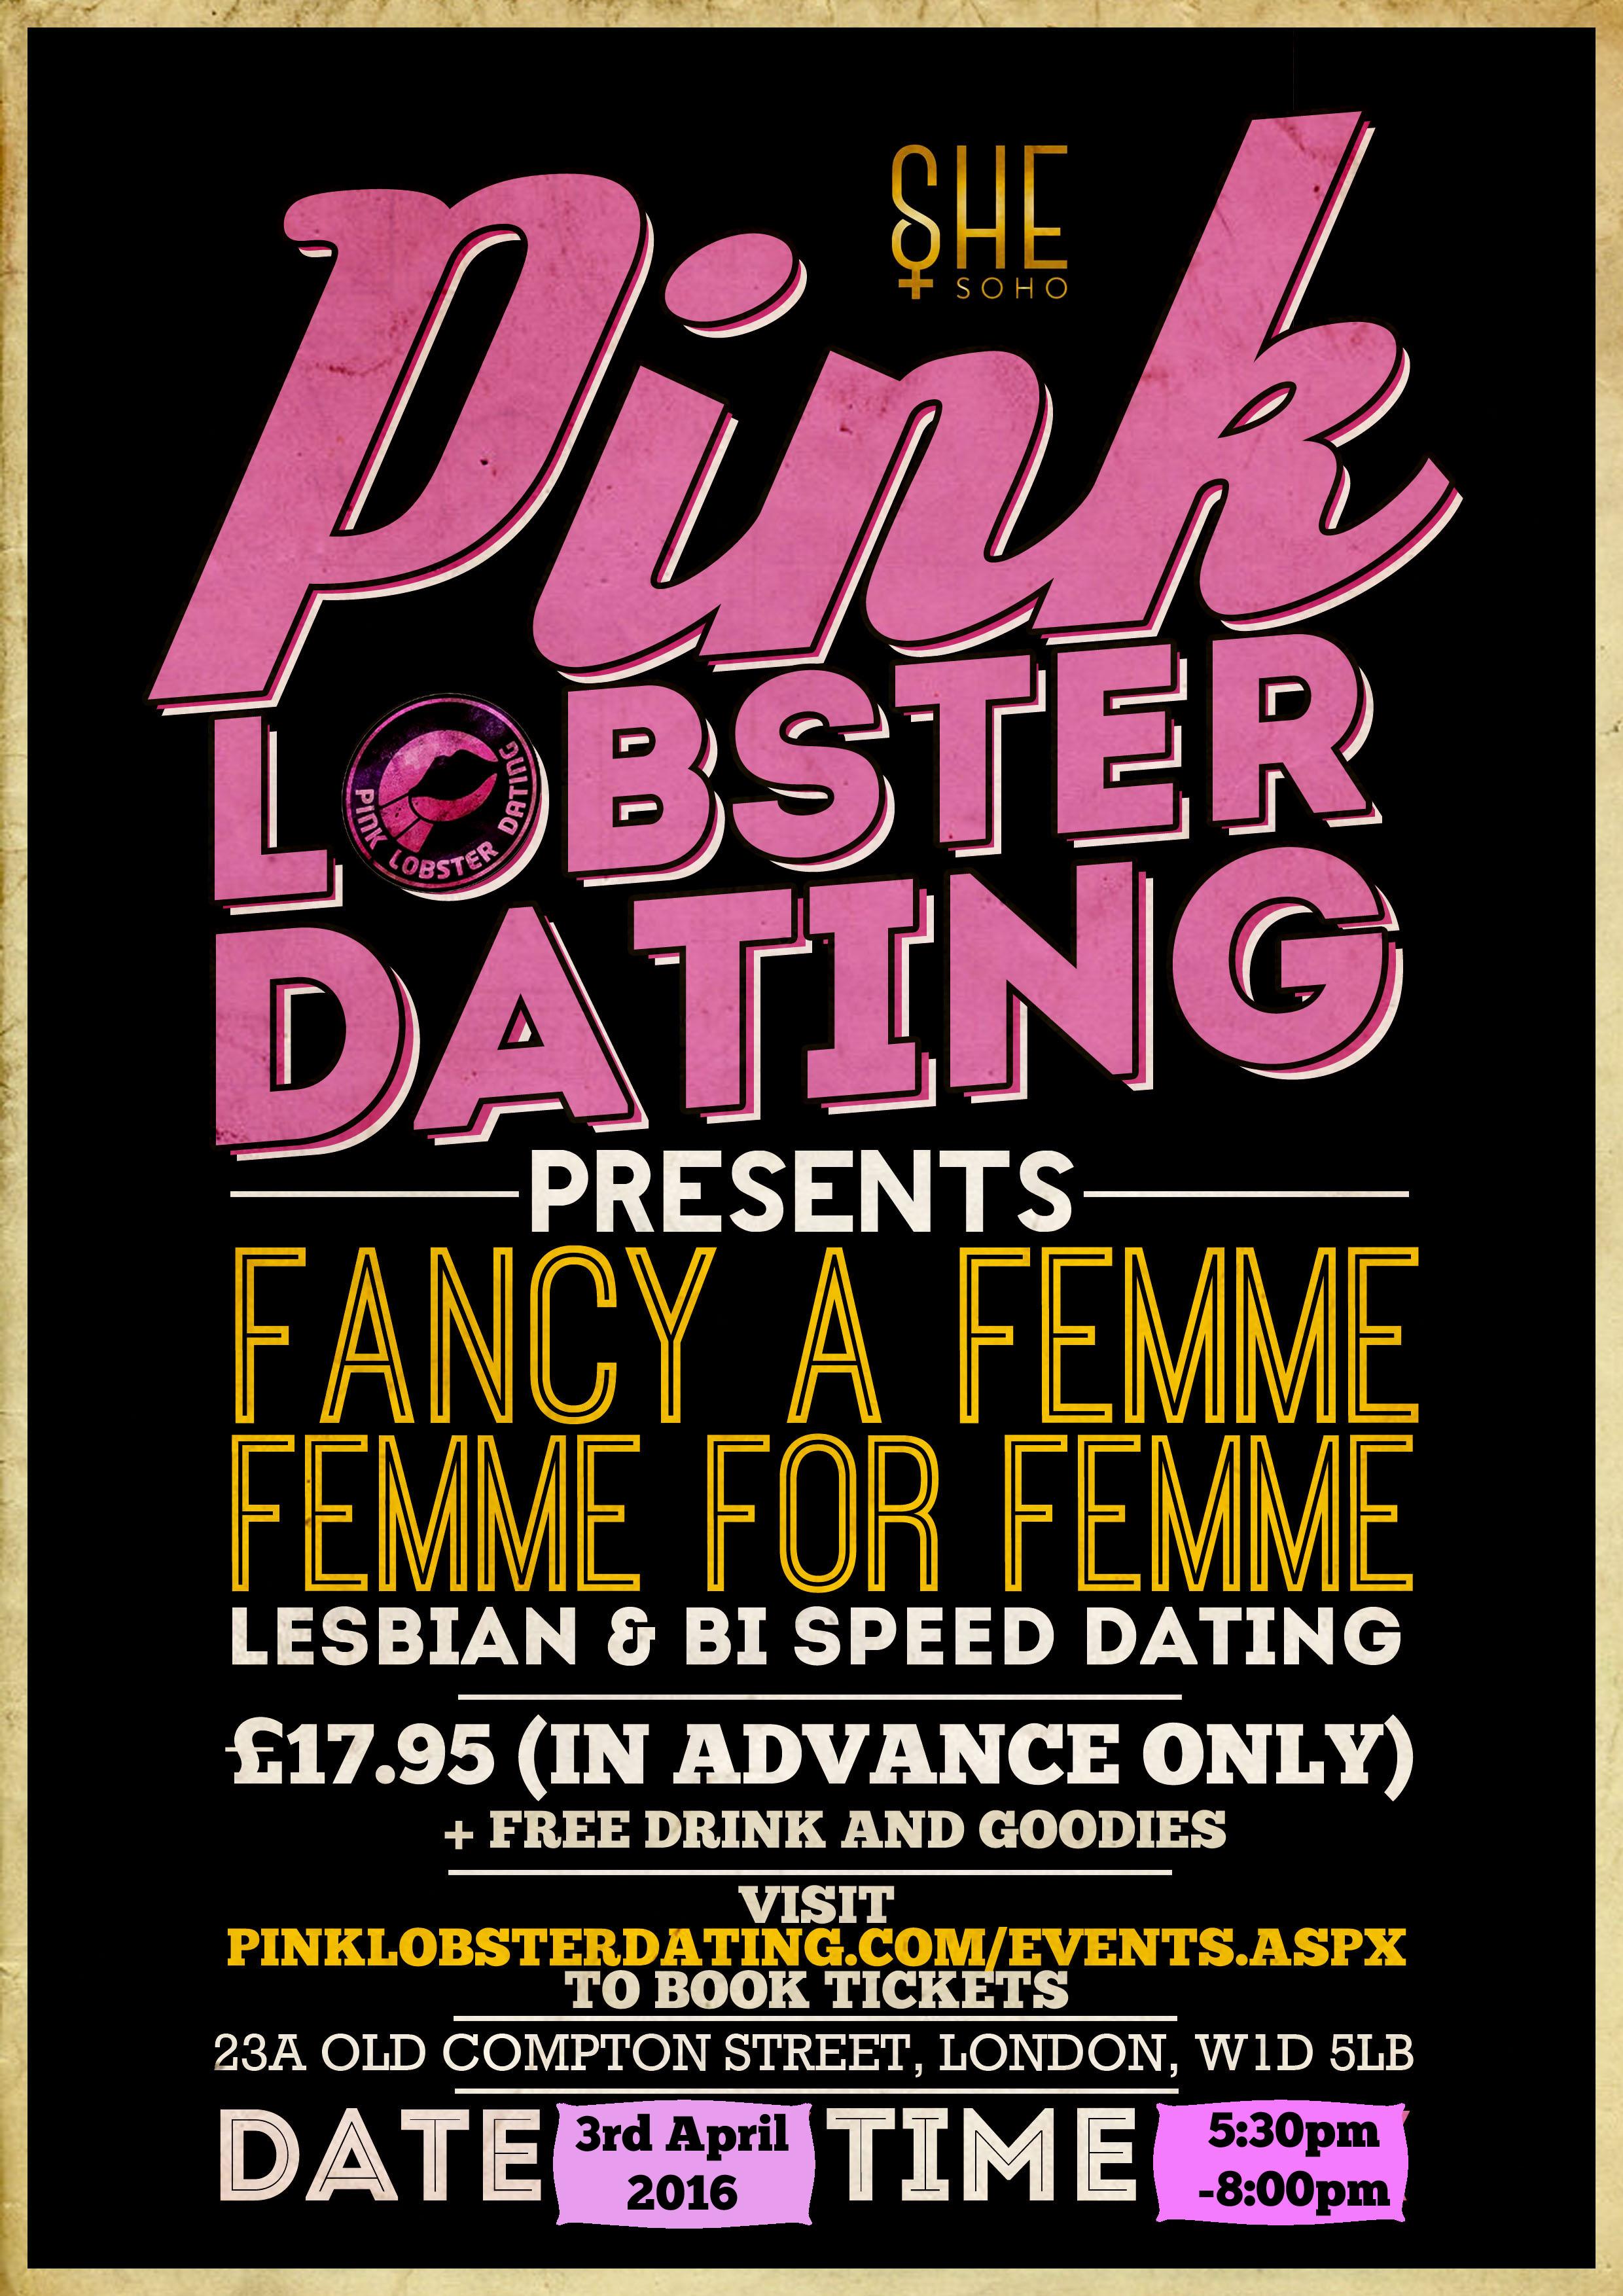 Fancy a Femme Lesbian Speed Dating at SHE Soho, London